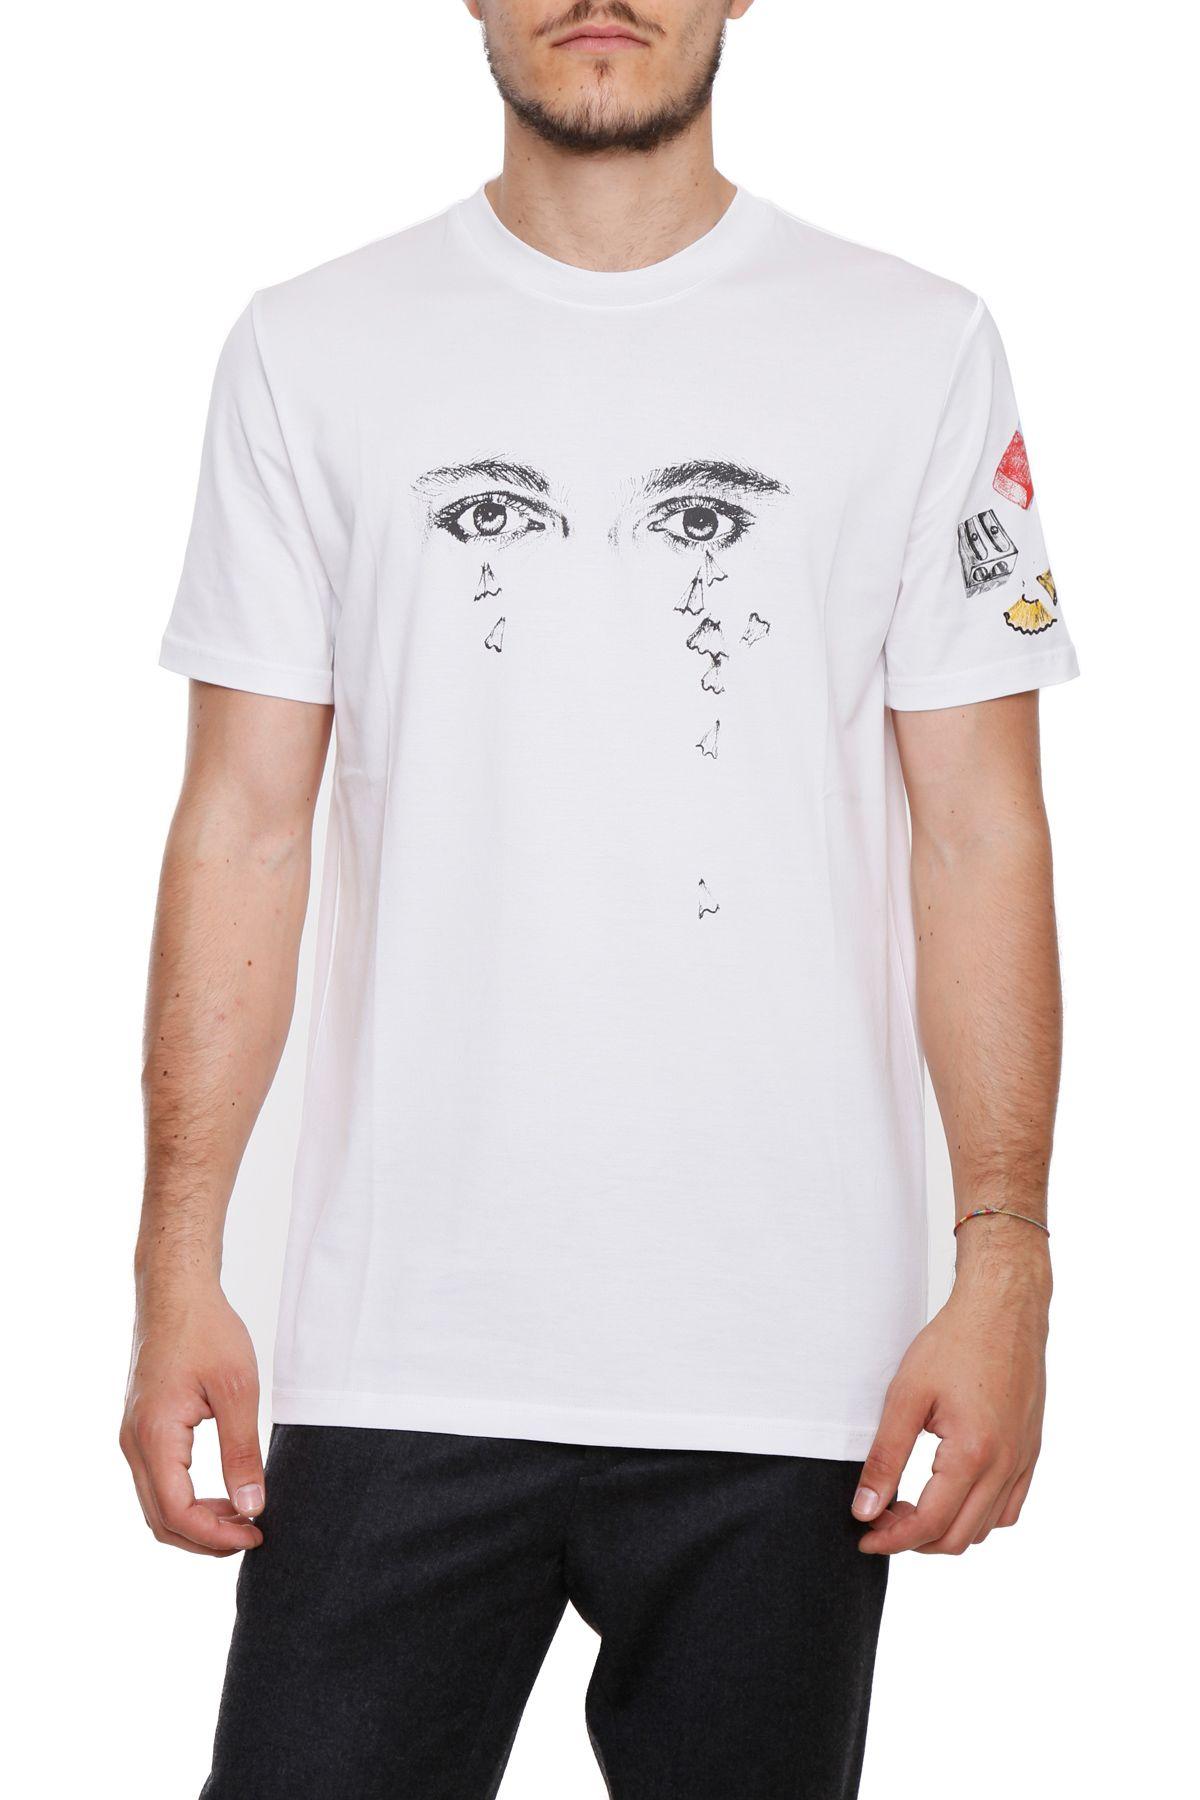 Cédric Rivrain Print T-shirt